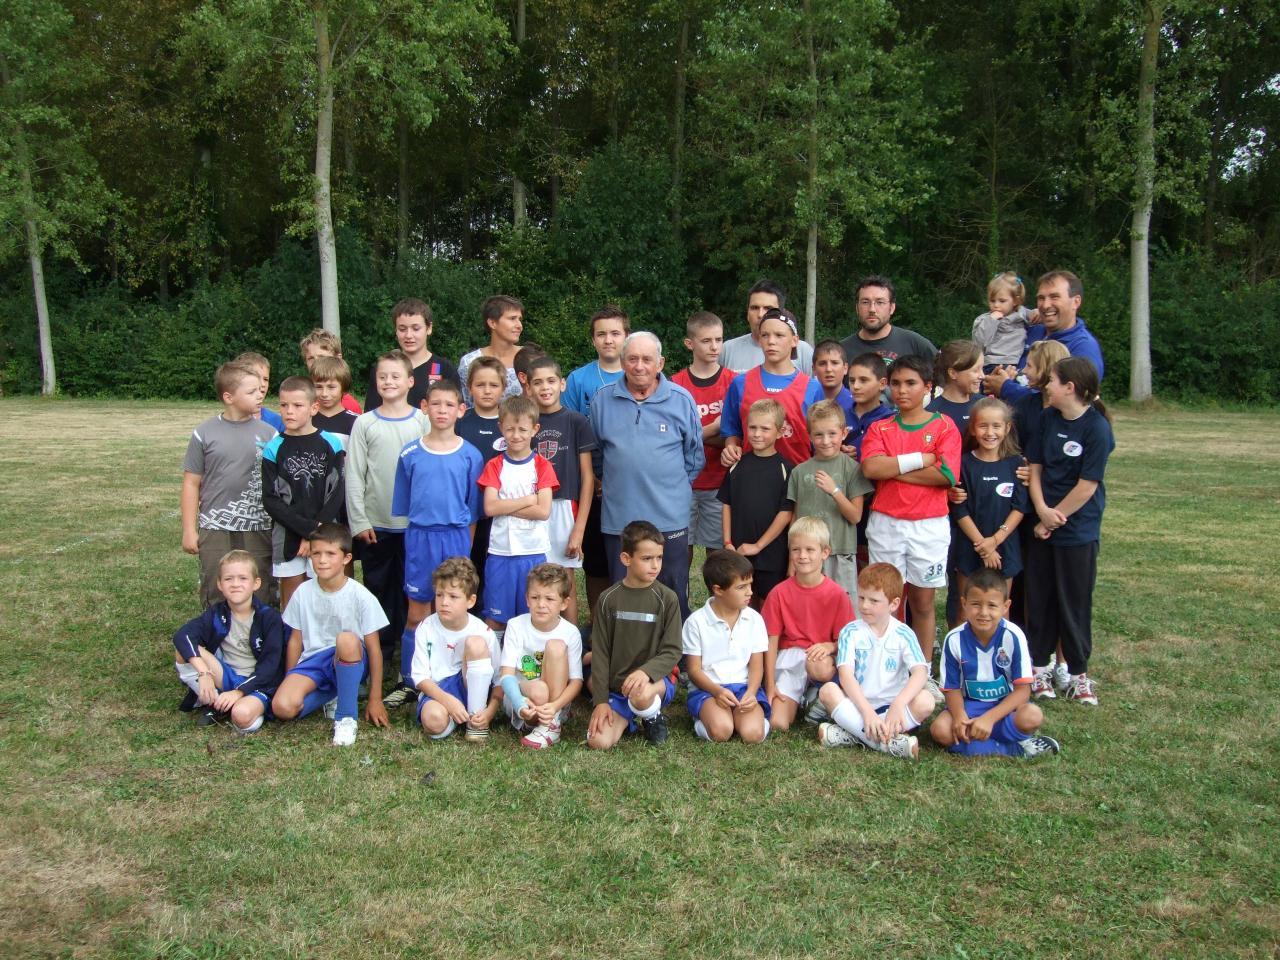 2009 09 tournoi de foot 020